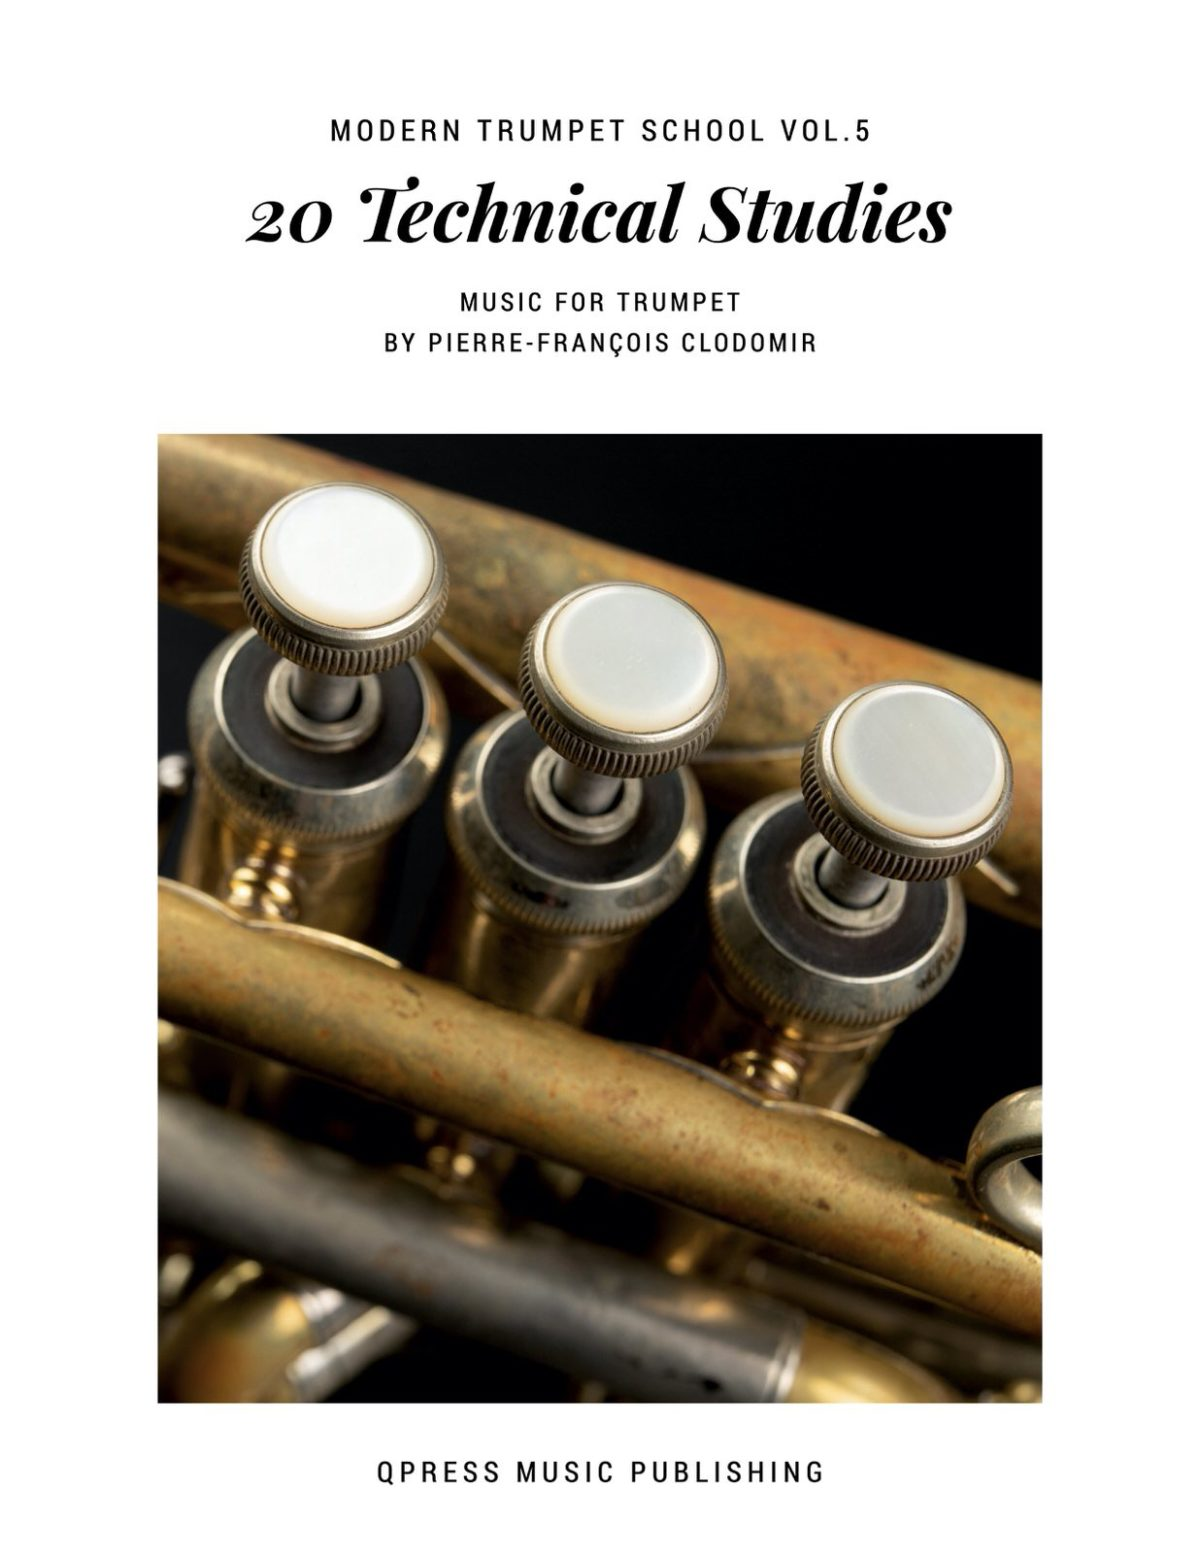 Clodomir, Modern Trumpet School 5, 20 Technical Studies-p01